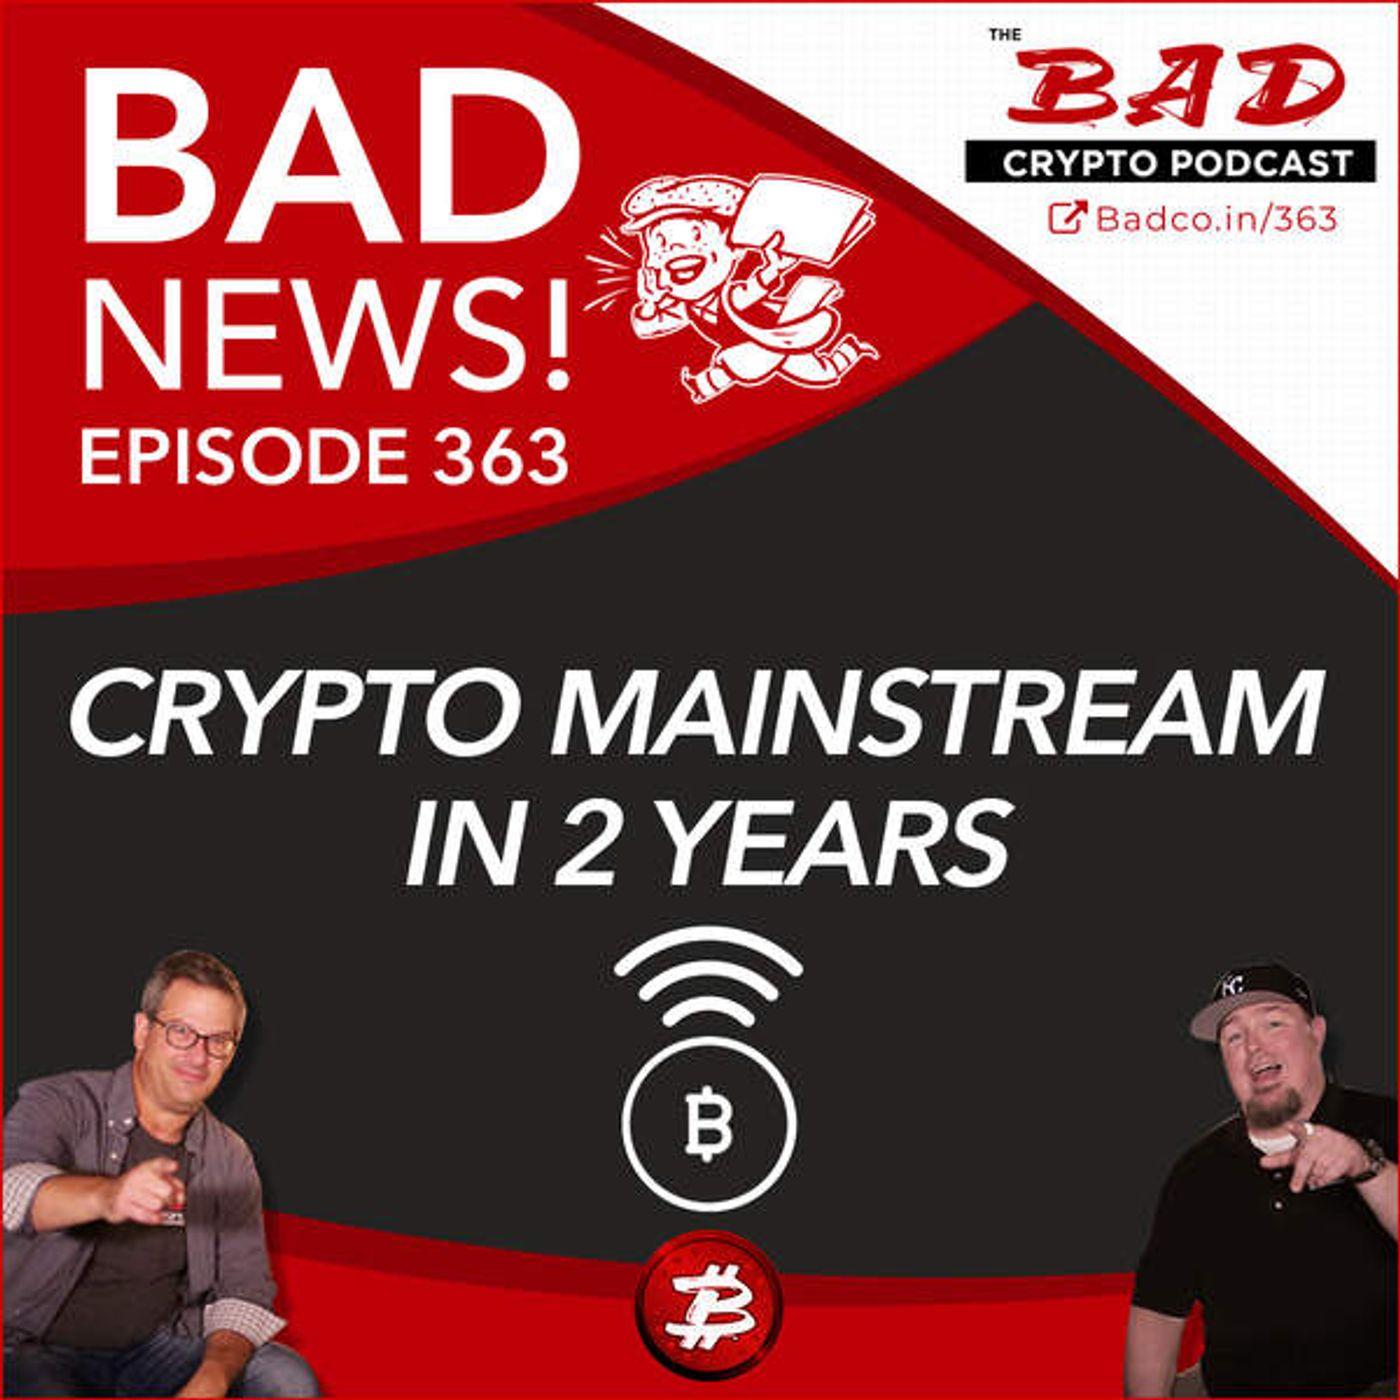 Heartland Newsfeed Podcast Network: The Bad Crypto Podcast (Crypto Mainstream in 2 Years - Bad News for January 30, 2020)